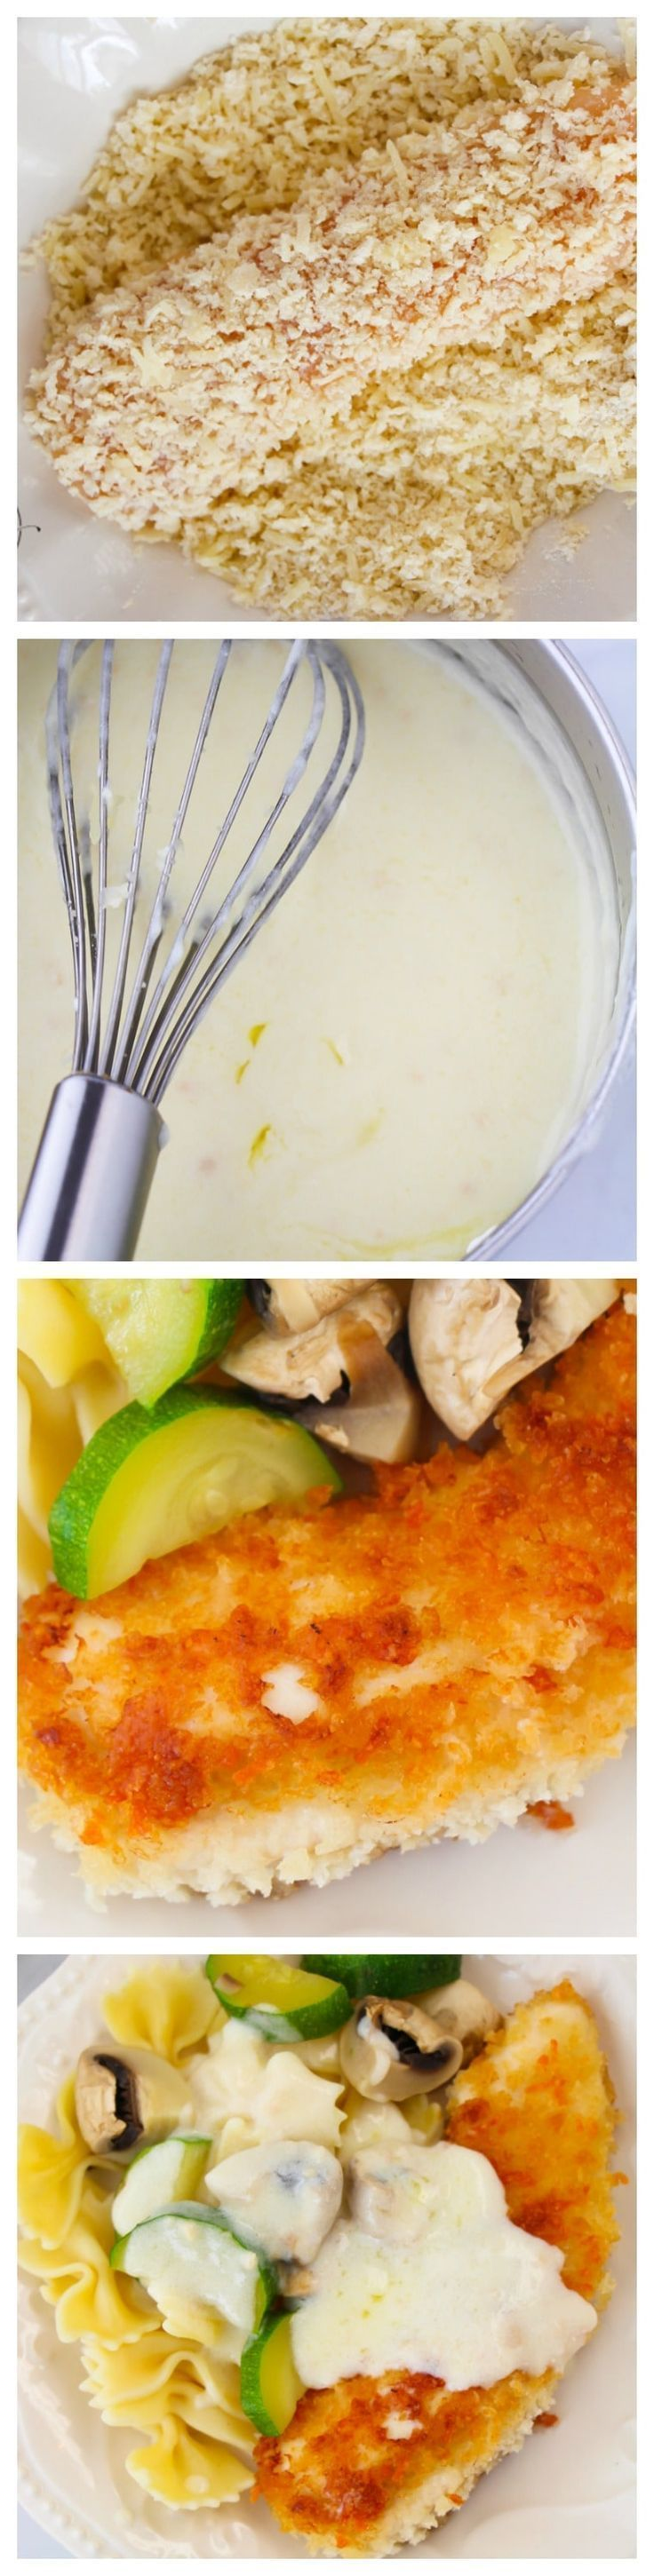 Olive Garden Chicken Parmesan Recipe Recipes, Cooking